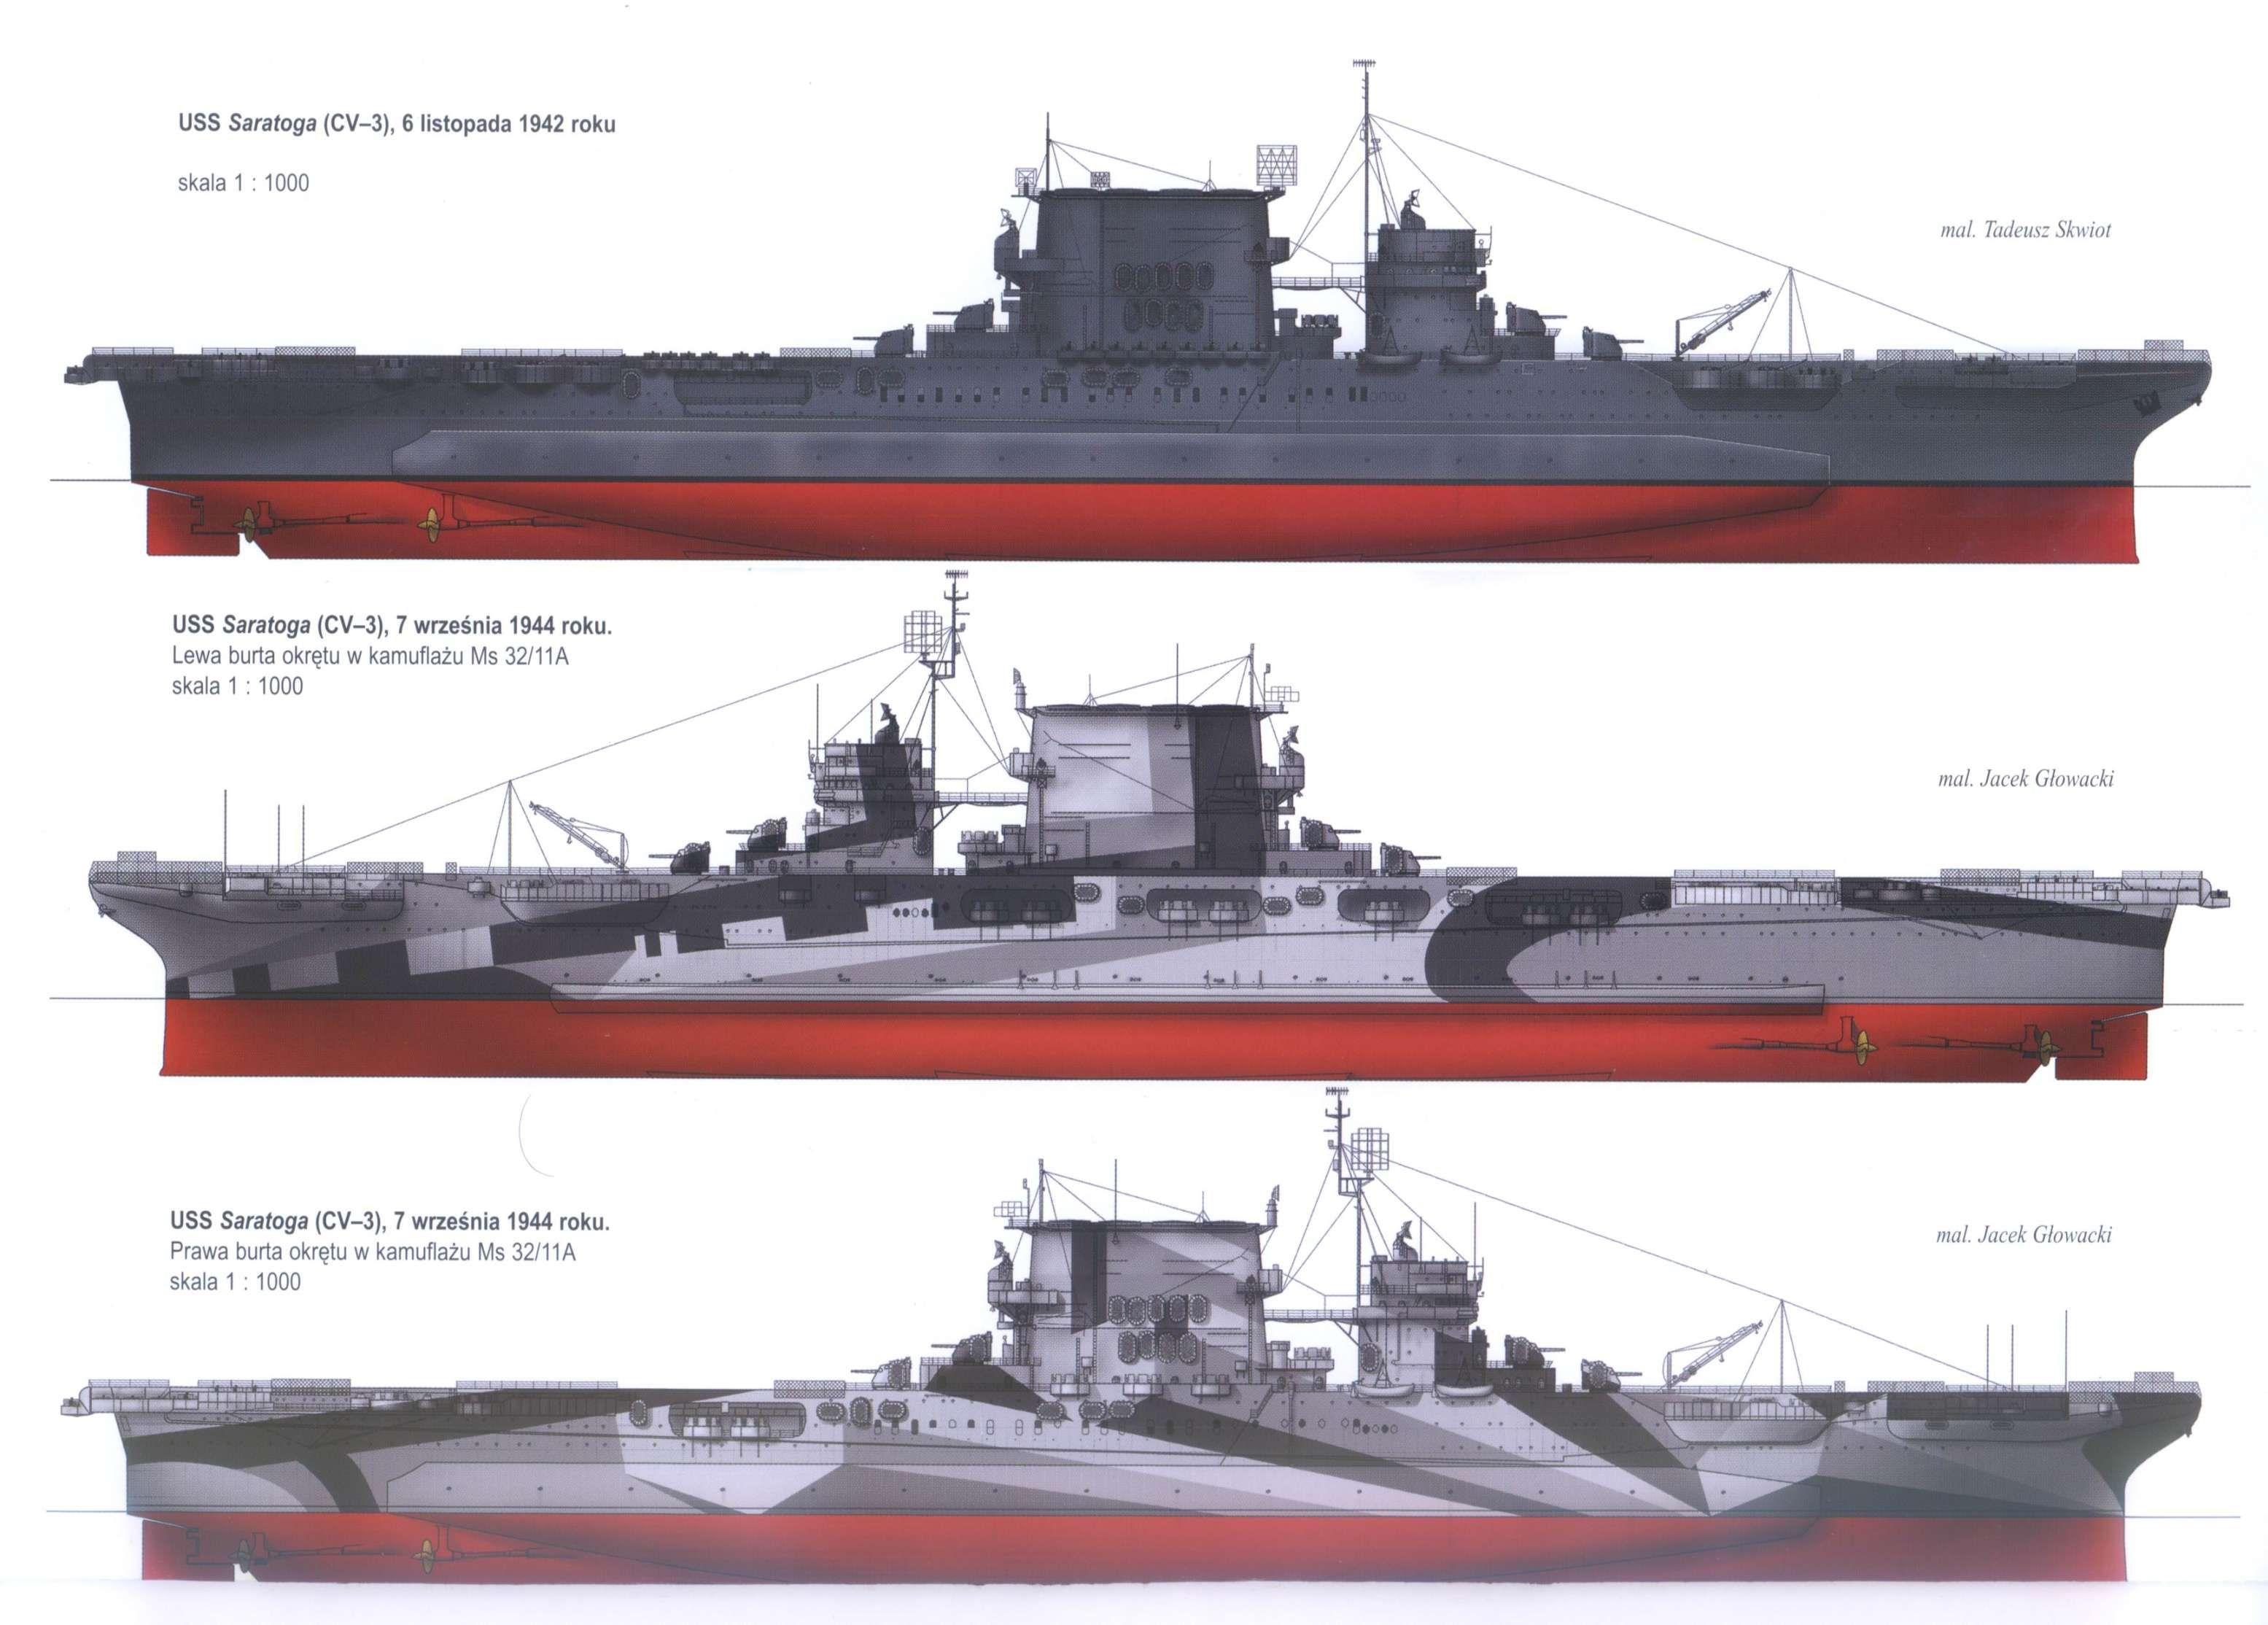 USS Saratoga (CV-3) Lexington-class US Navy aircraft carrier ...